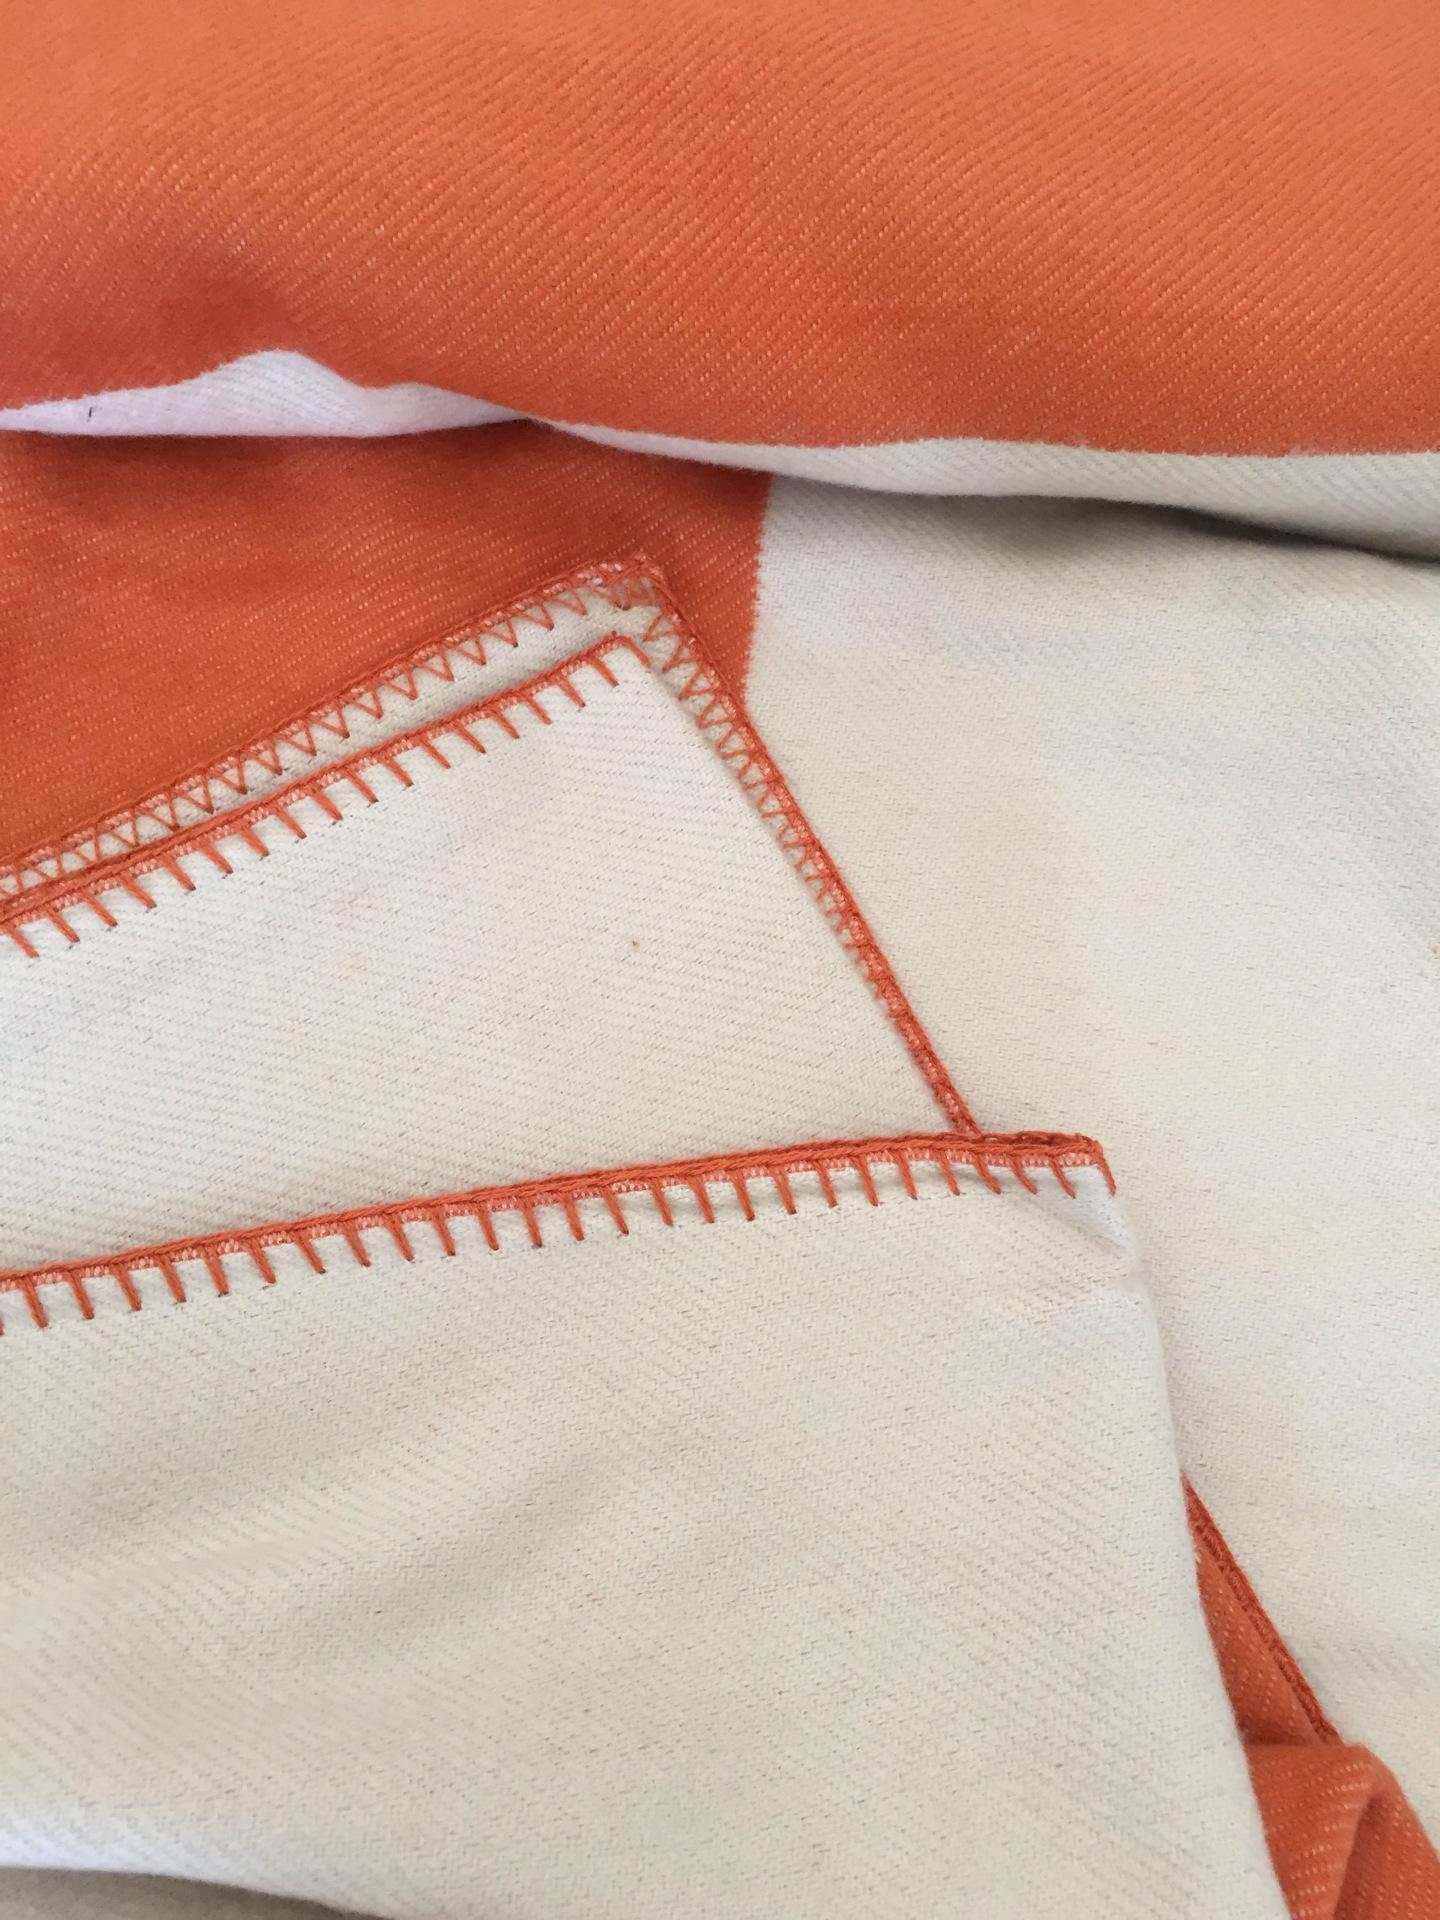 Carta Cobertor de lã macia lenço xale portátil mamífero xadrez sofá cama velo primavera outono mulheres jogar cobertores